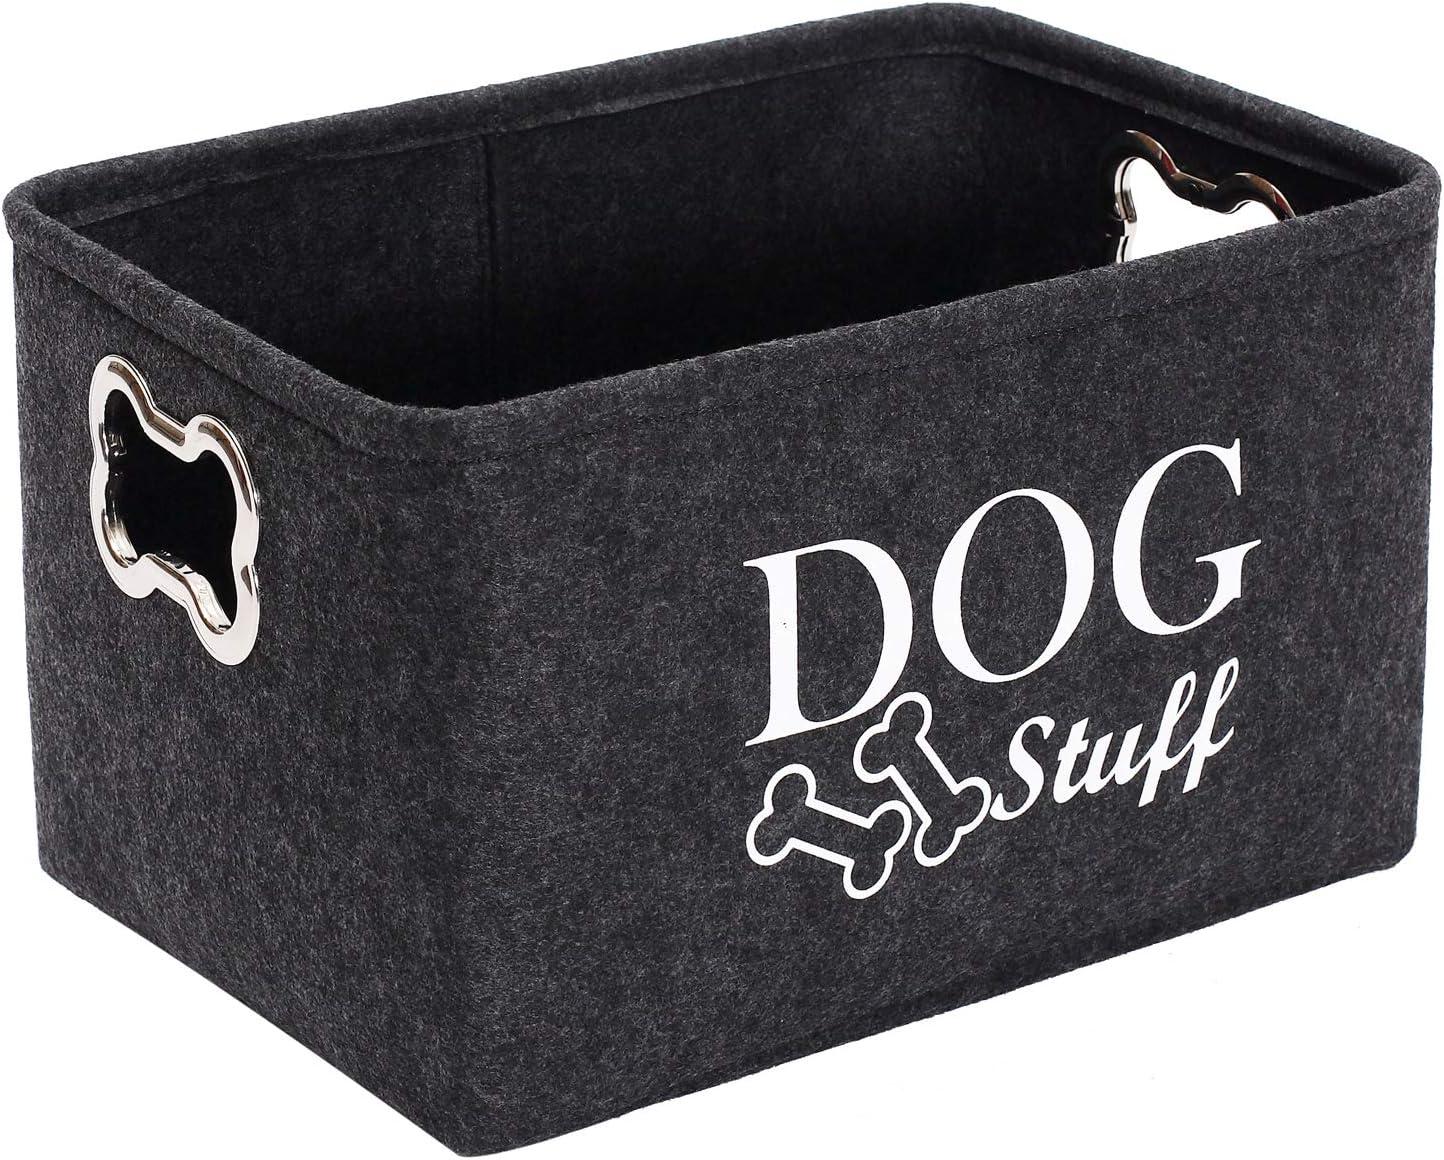 Felt Puppy Stuff shipfree Baskets Dog Toy Max 89% OFF Designed Storage bin Meta with